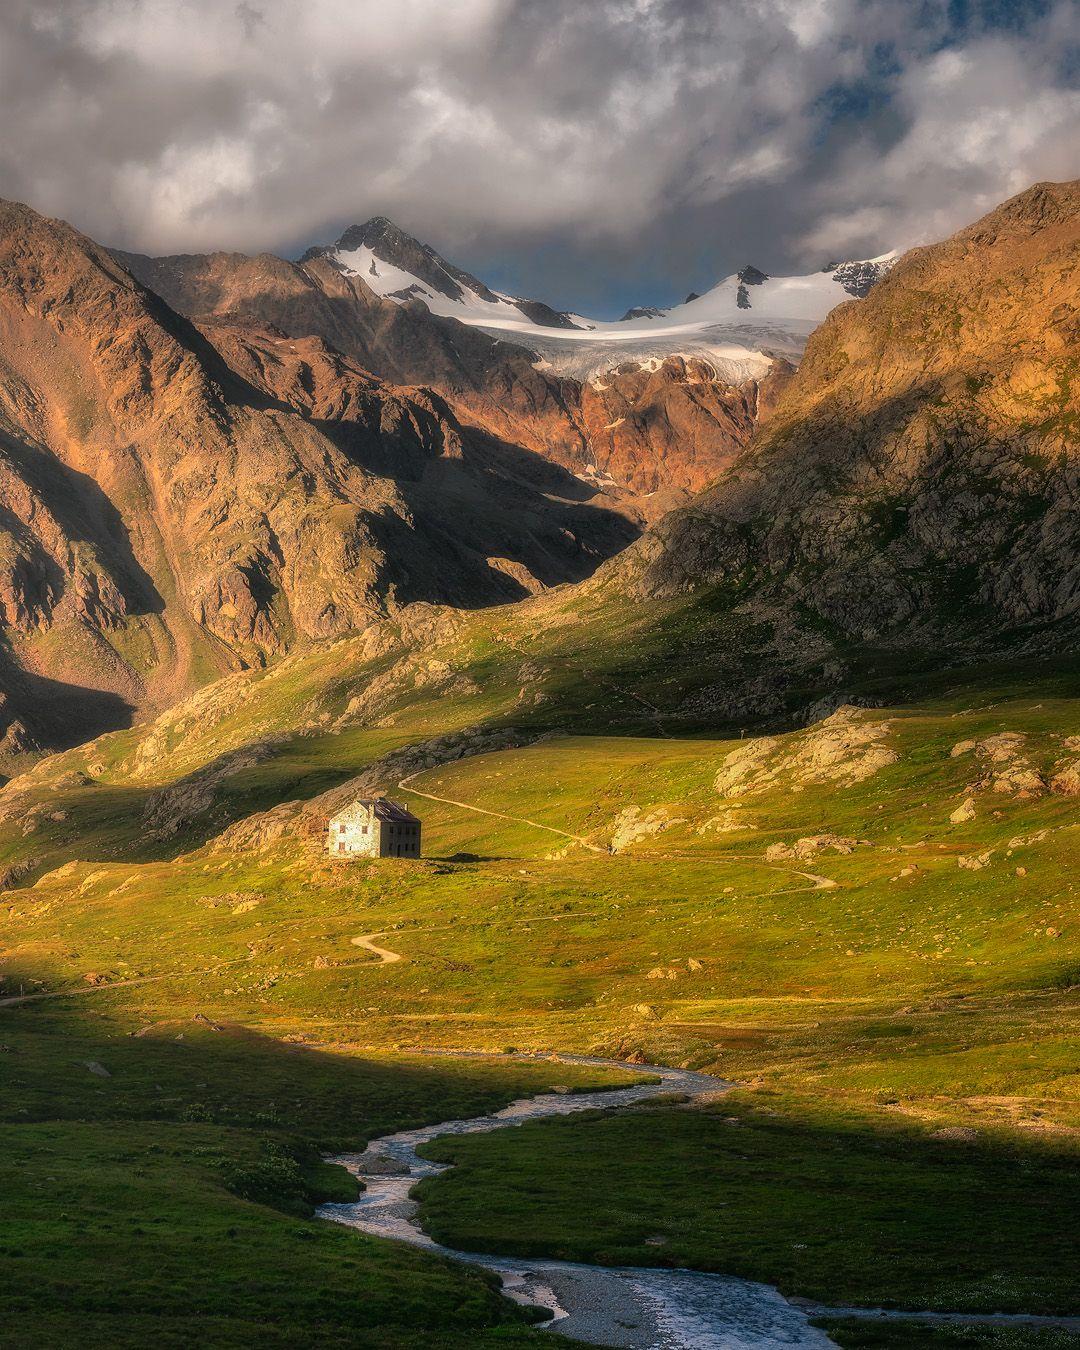 alps, travel, mountains, Perlikowski Jakub